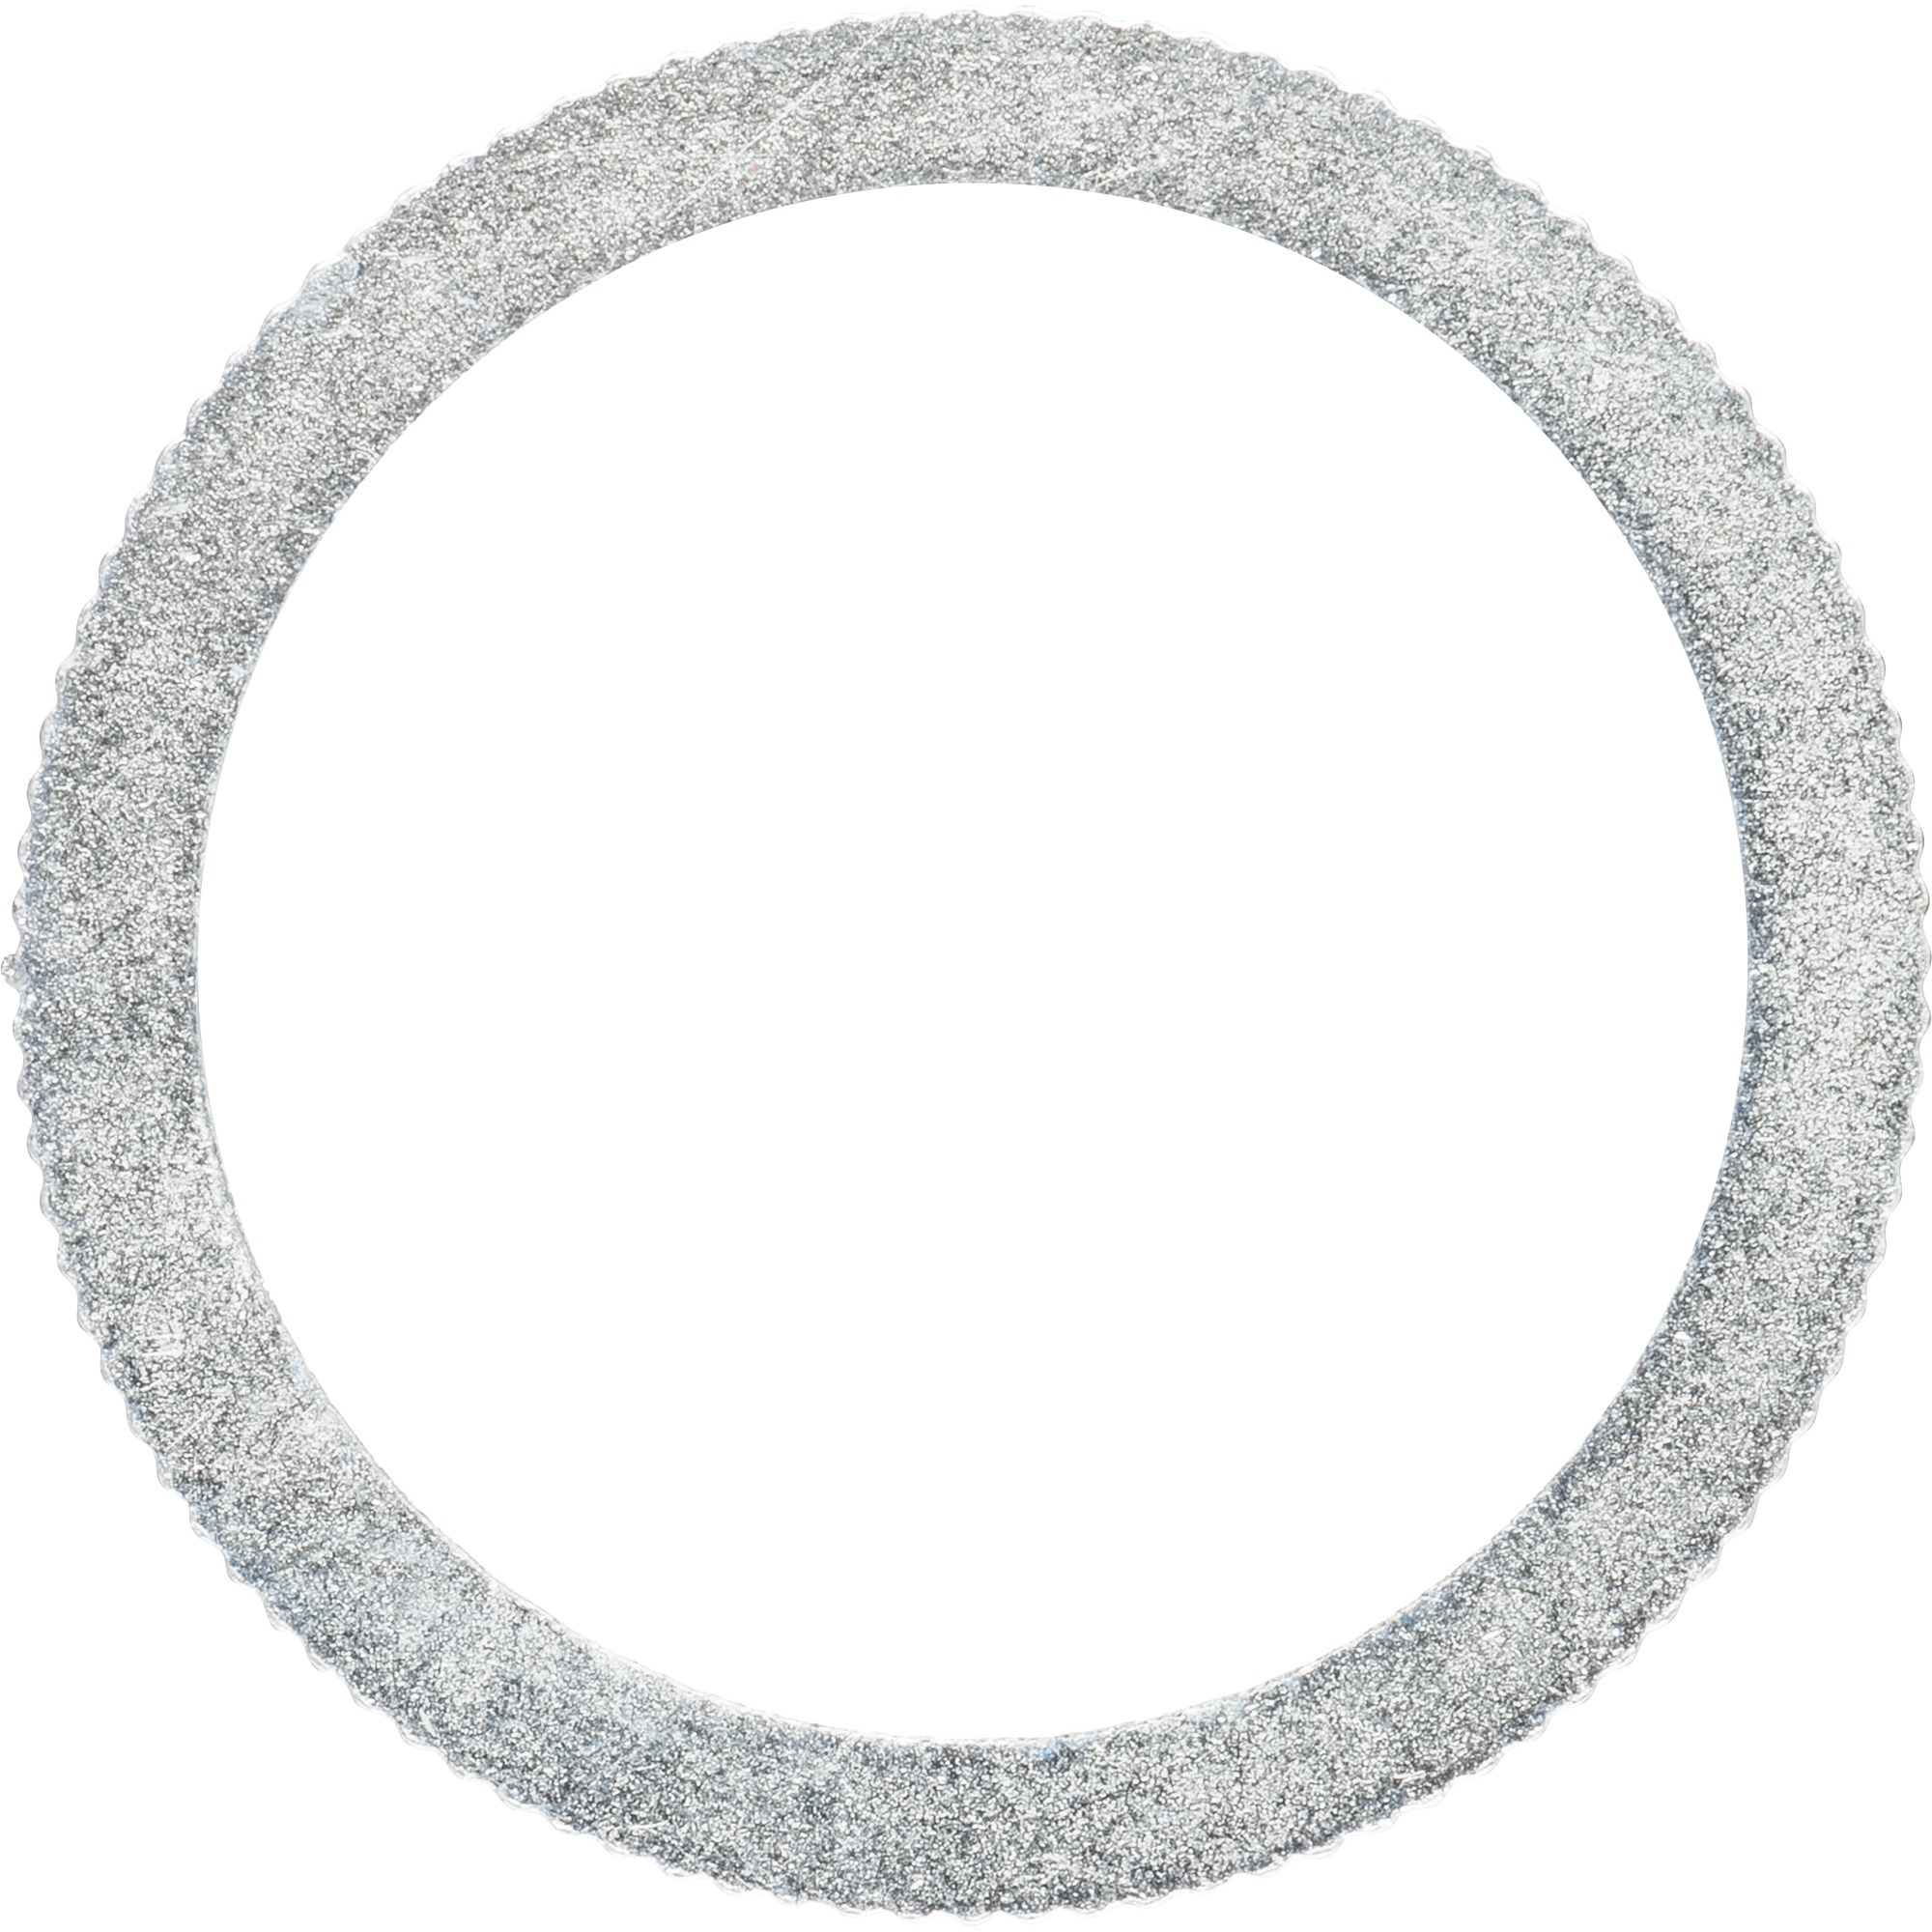 2 600 100 209 accesorio de sierras circulares, Adaptador